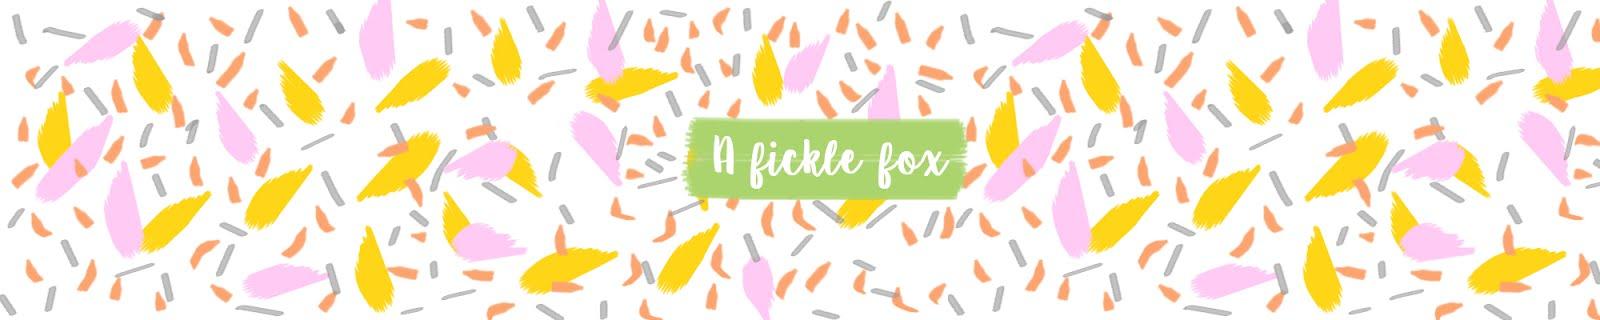 A fickle fox